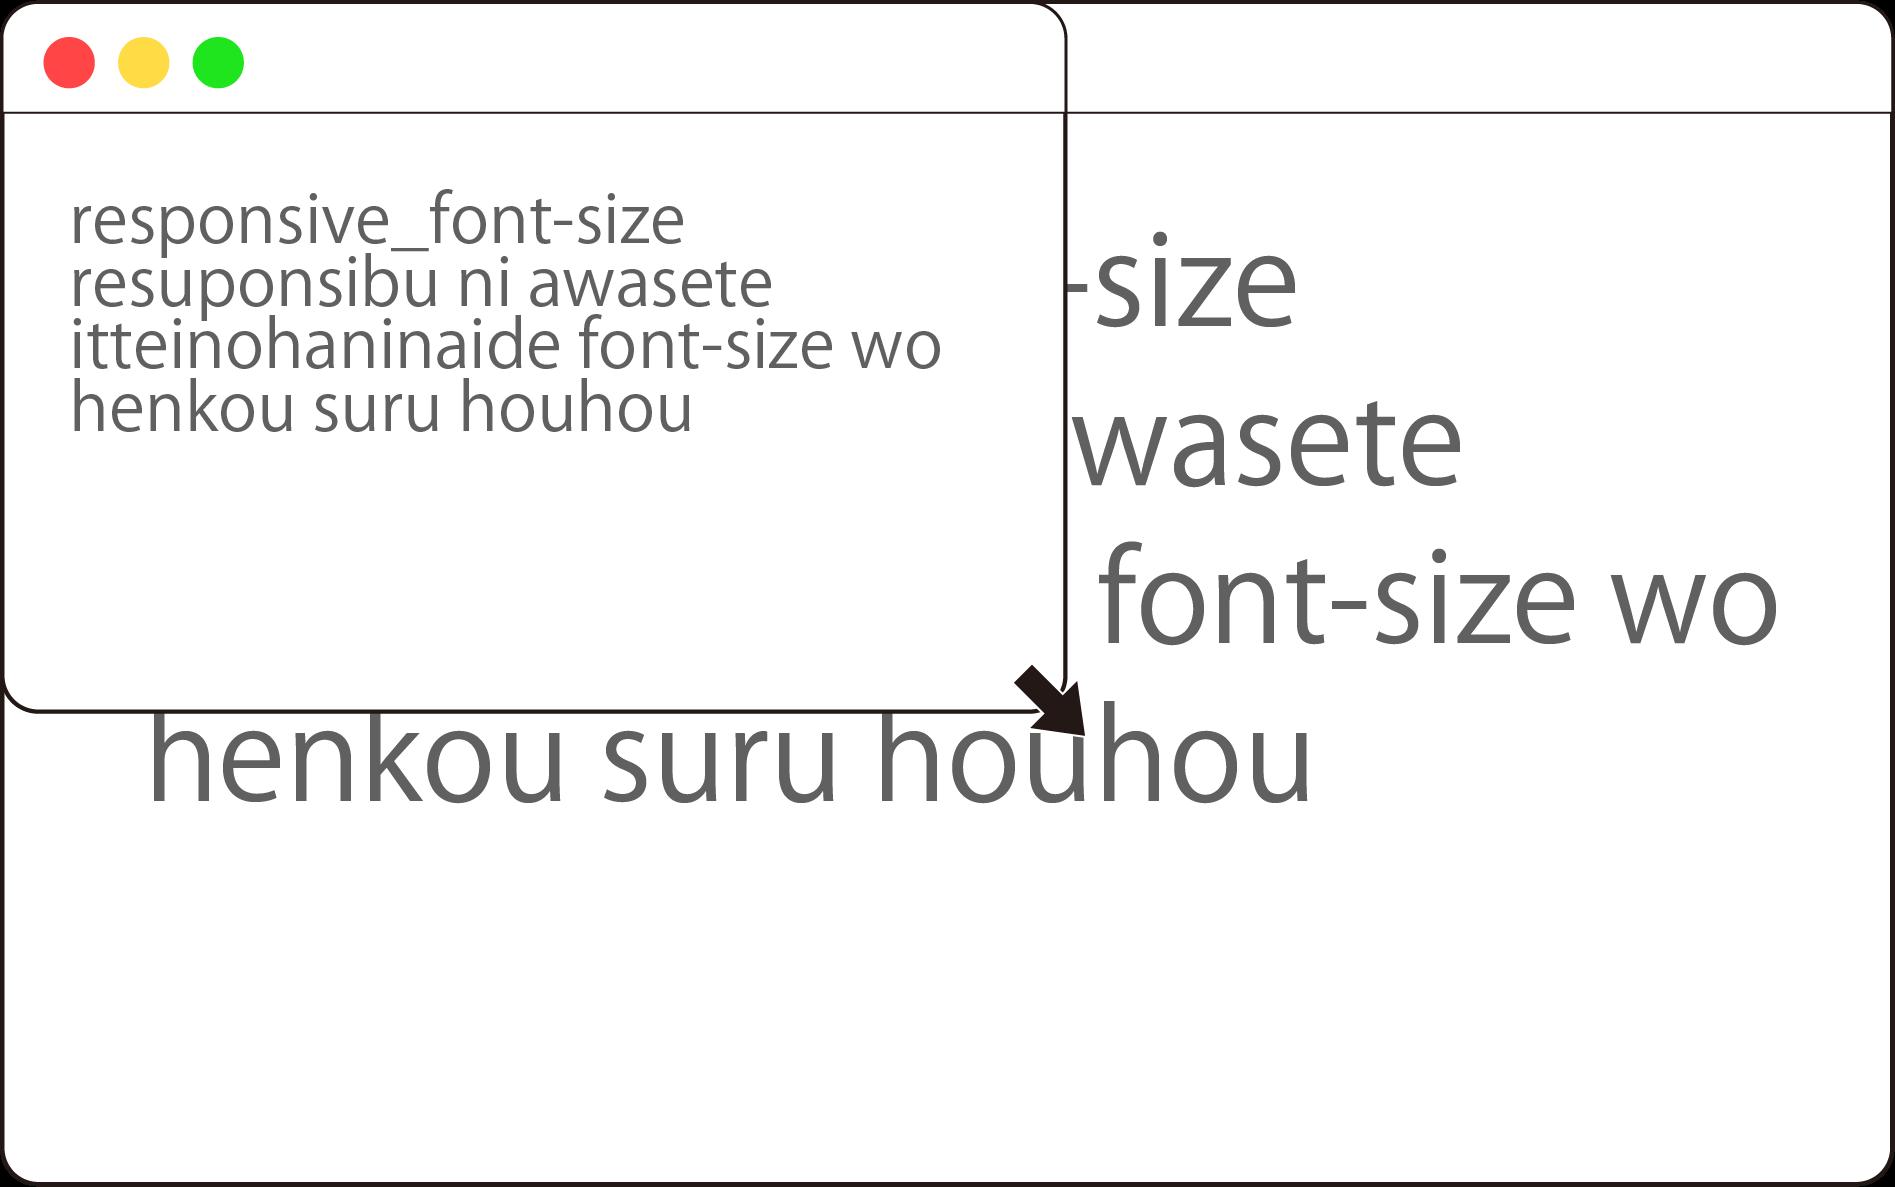 responsive_font_size